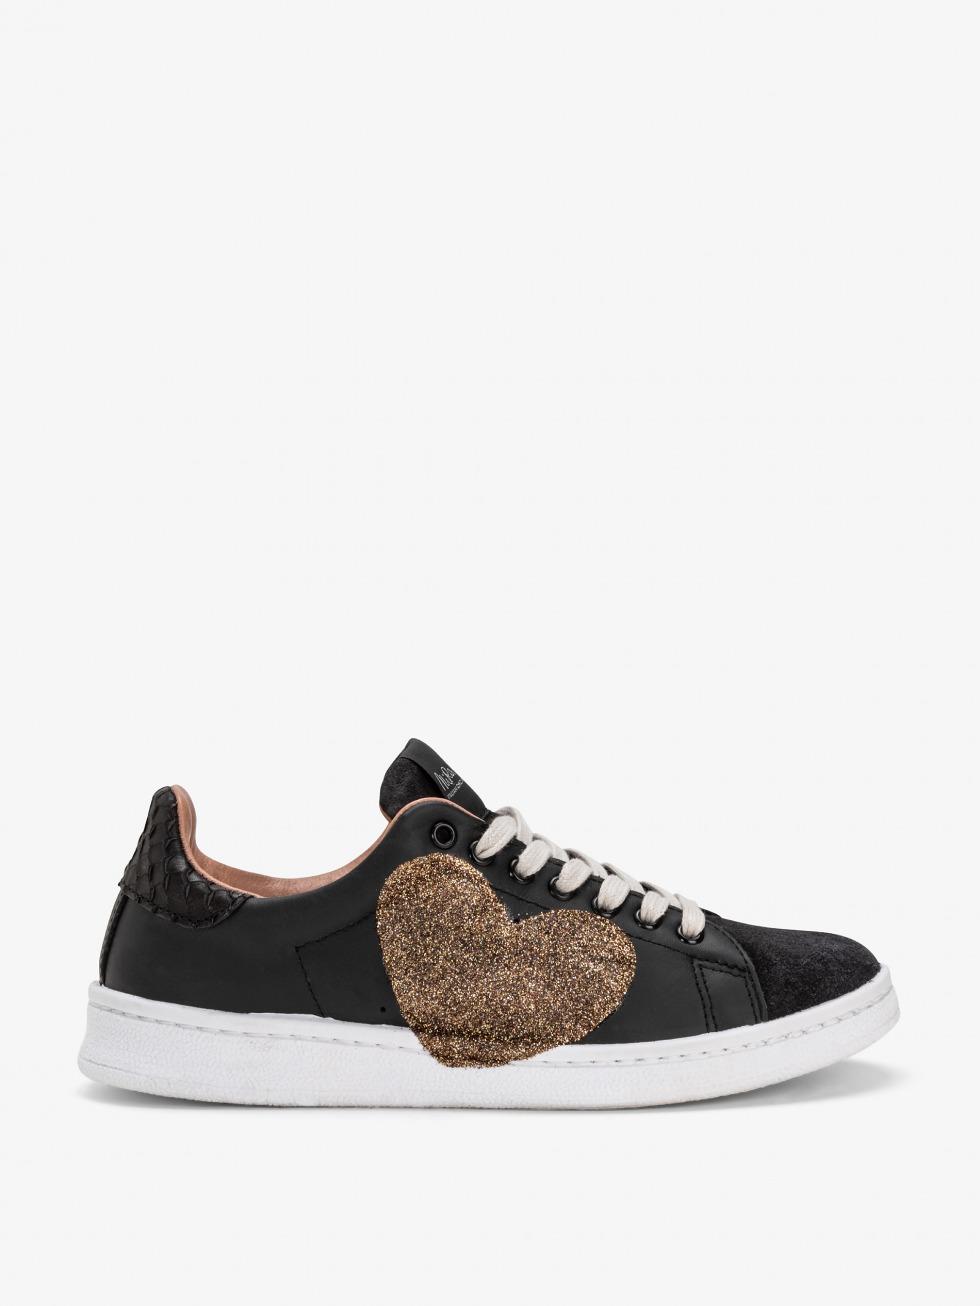 Daiquiri Boa Black Sneakers - Glitter Heart